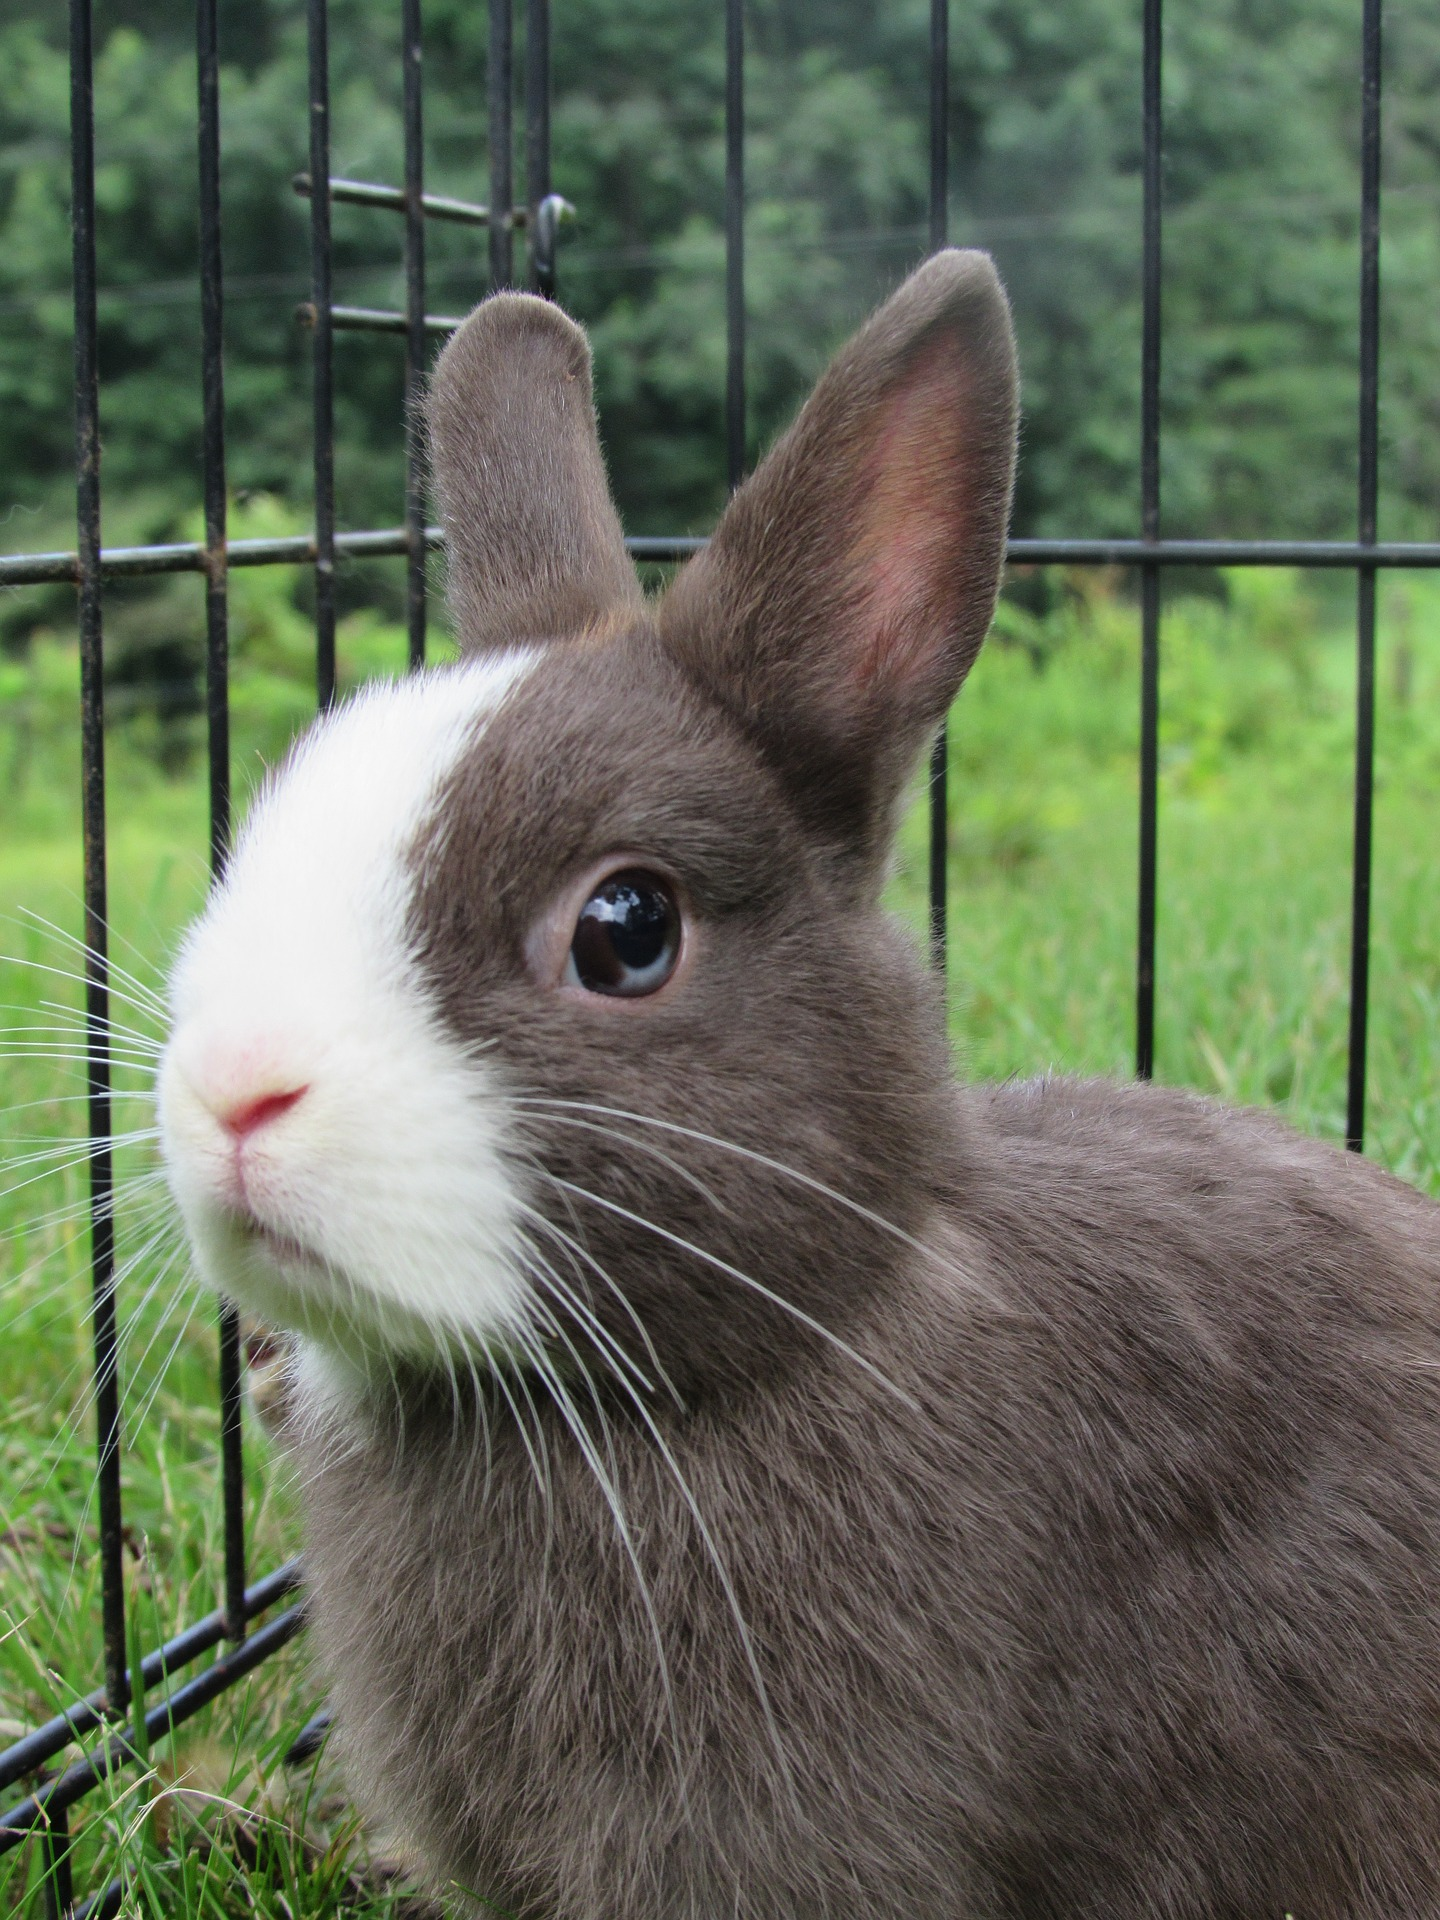 rabbit-2502615_1920.jpg